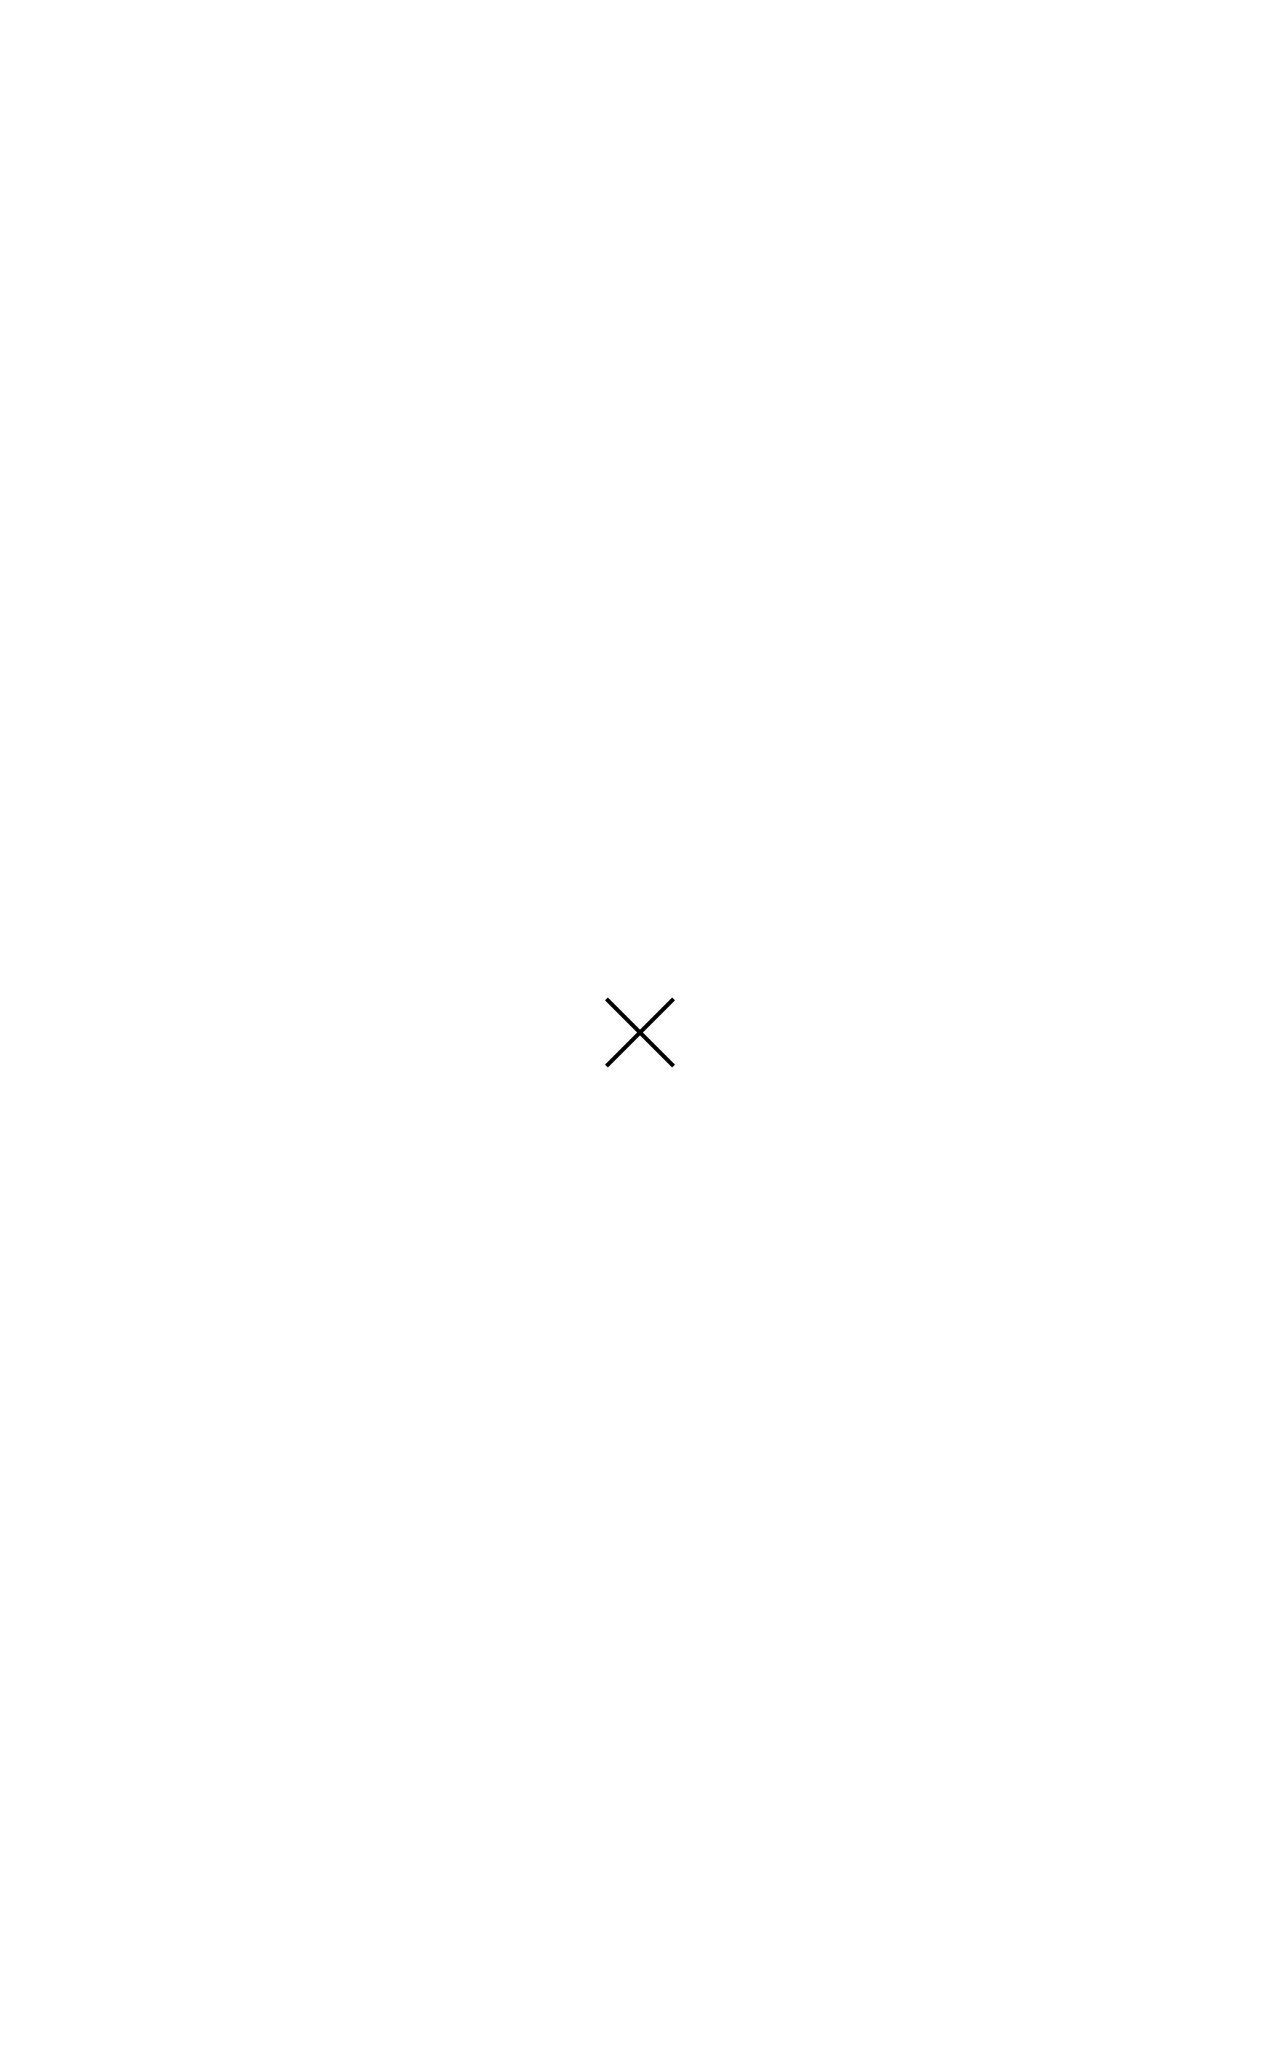 blanco_1_x